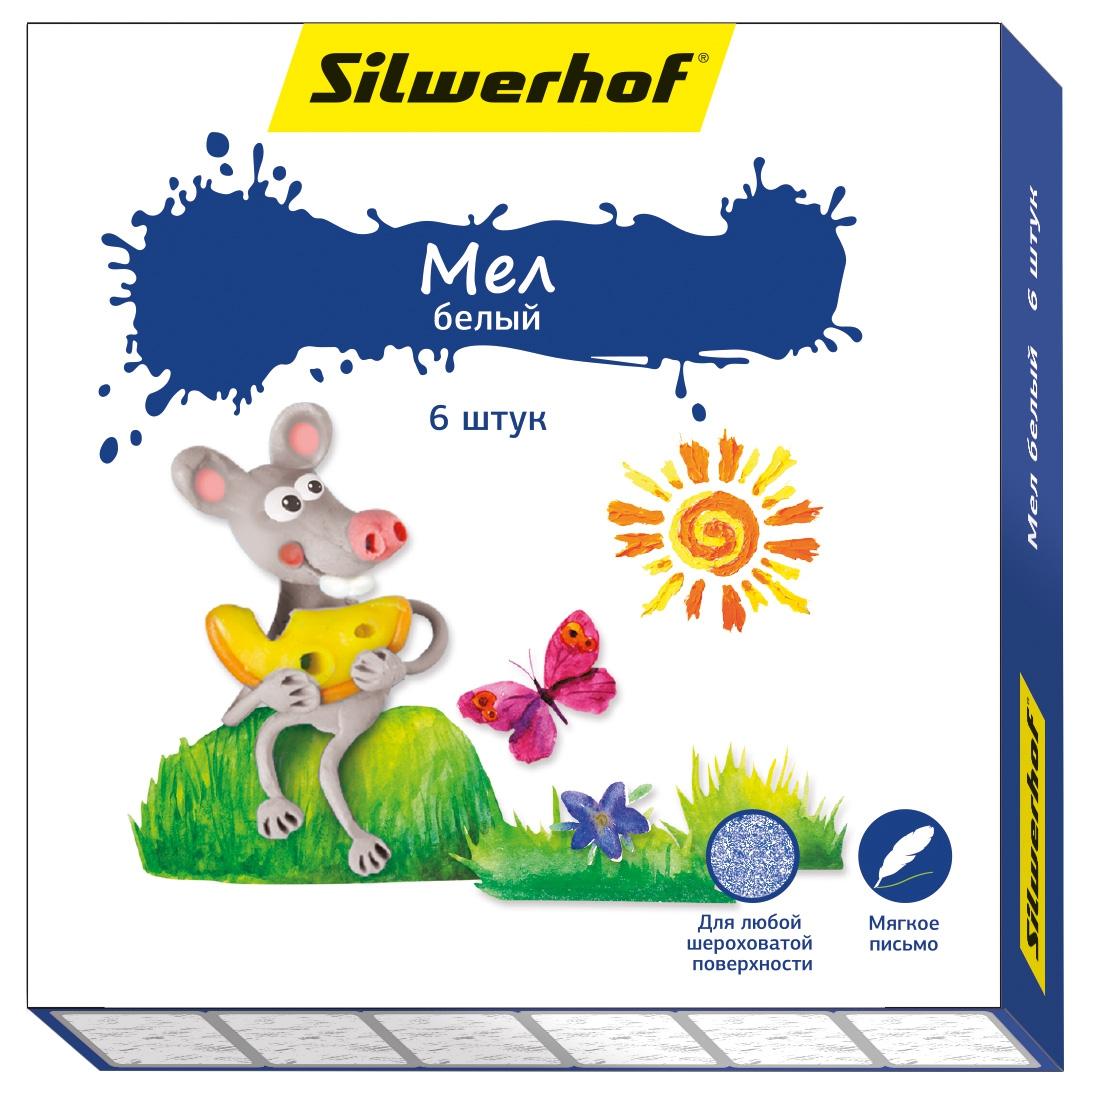 Мел Silwerhof белый Пластилиновая коллекция 6 шт. настольная игра dream makers кто я 1311h